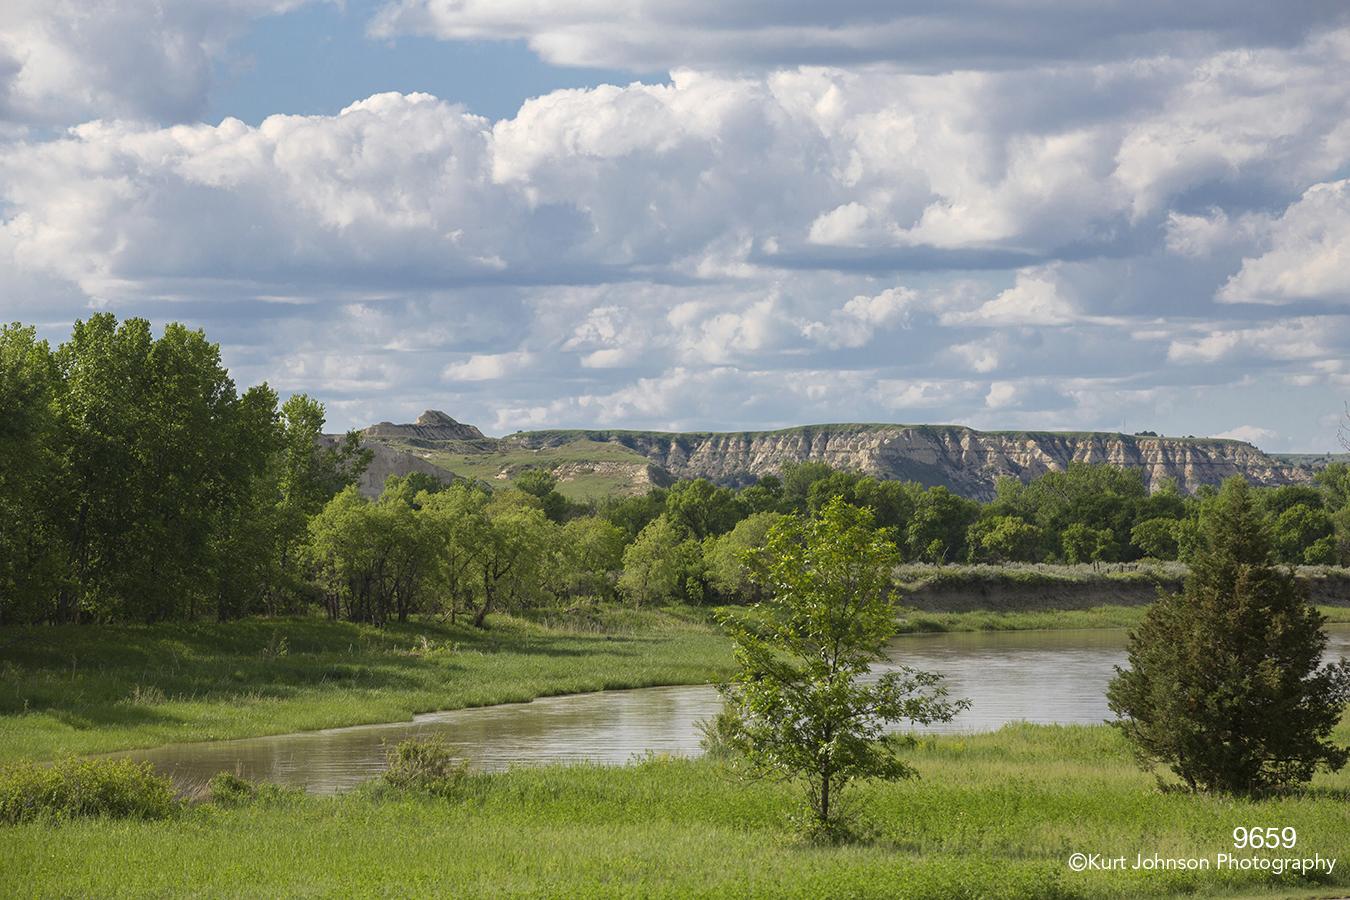 landscape river water mountains grasses trees clouds dakota